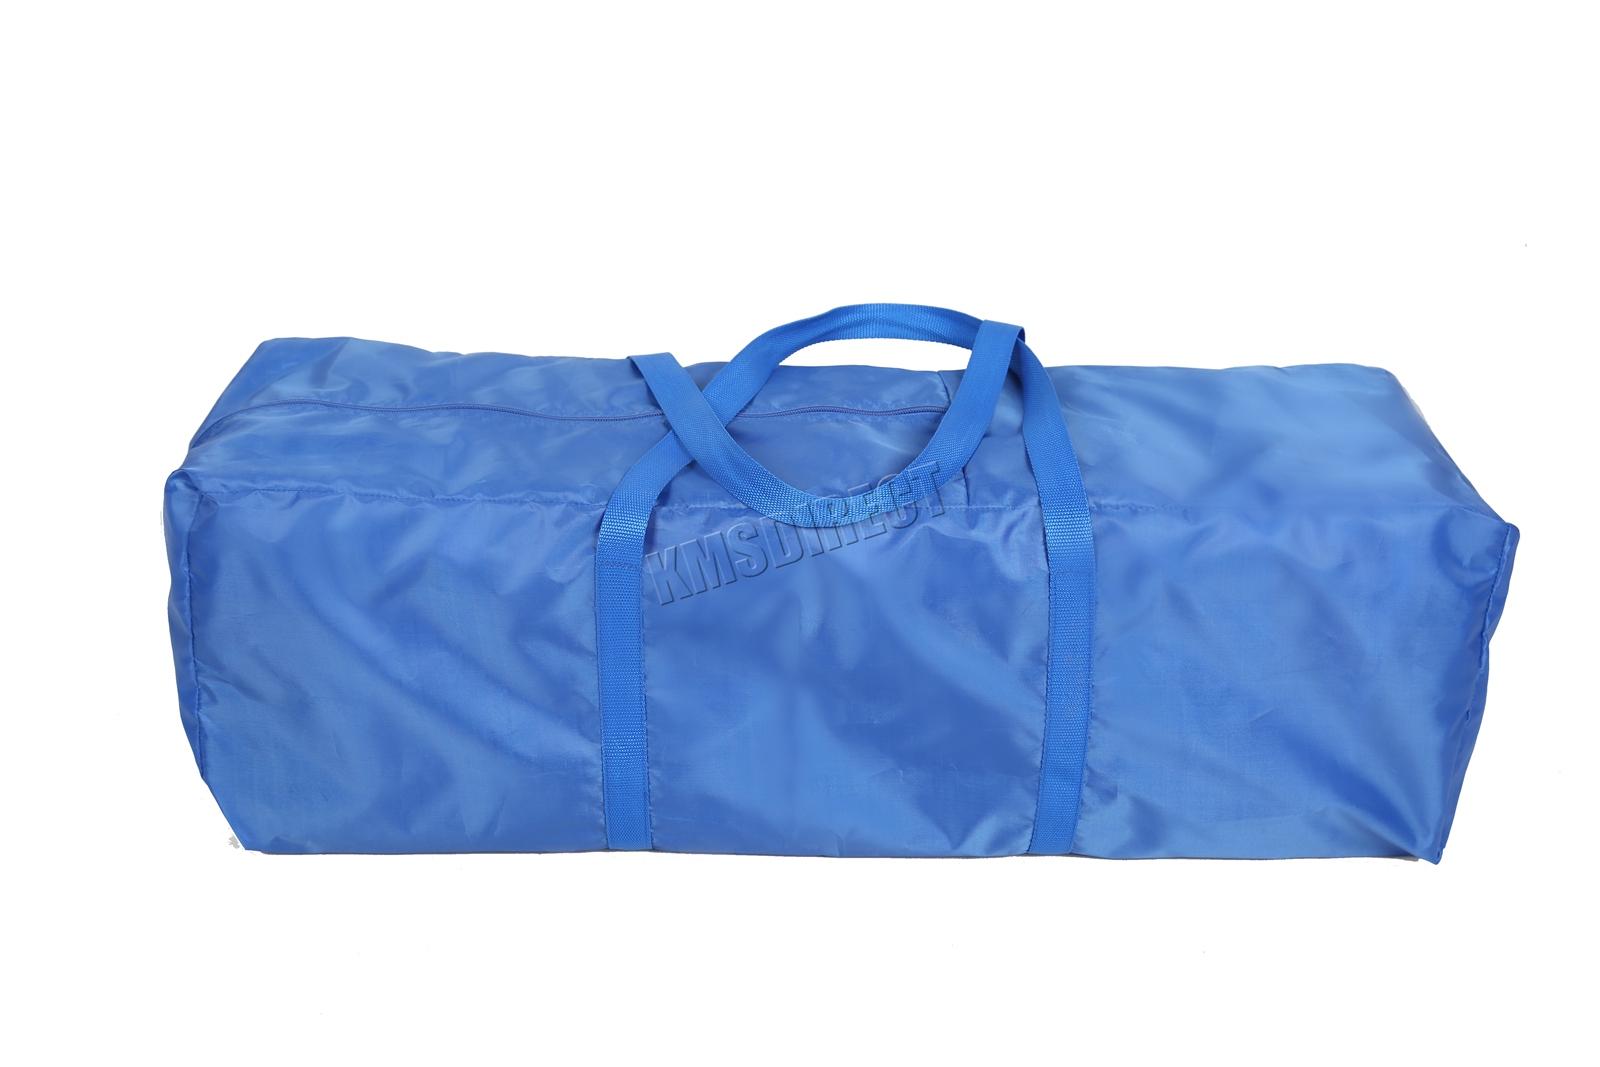 FoxHunter Portable Baby Travel Cot Bed Kids Infant Playpen Bassinet BCB01